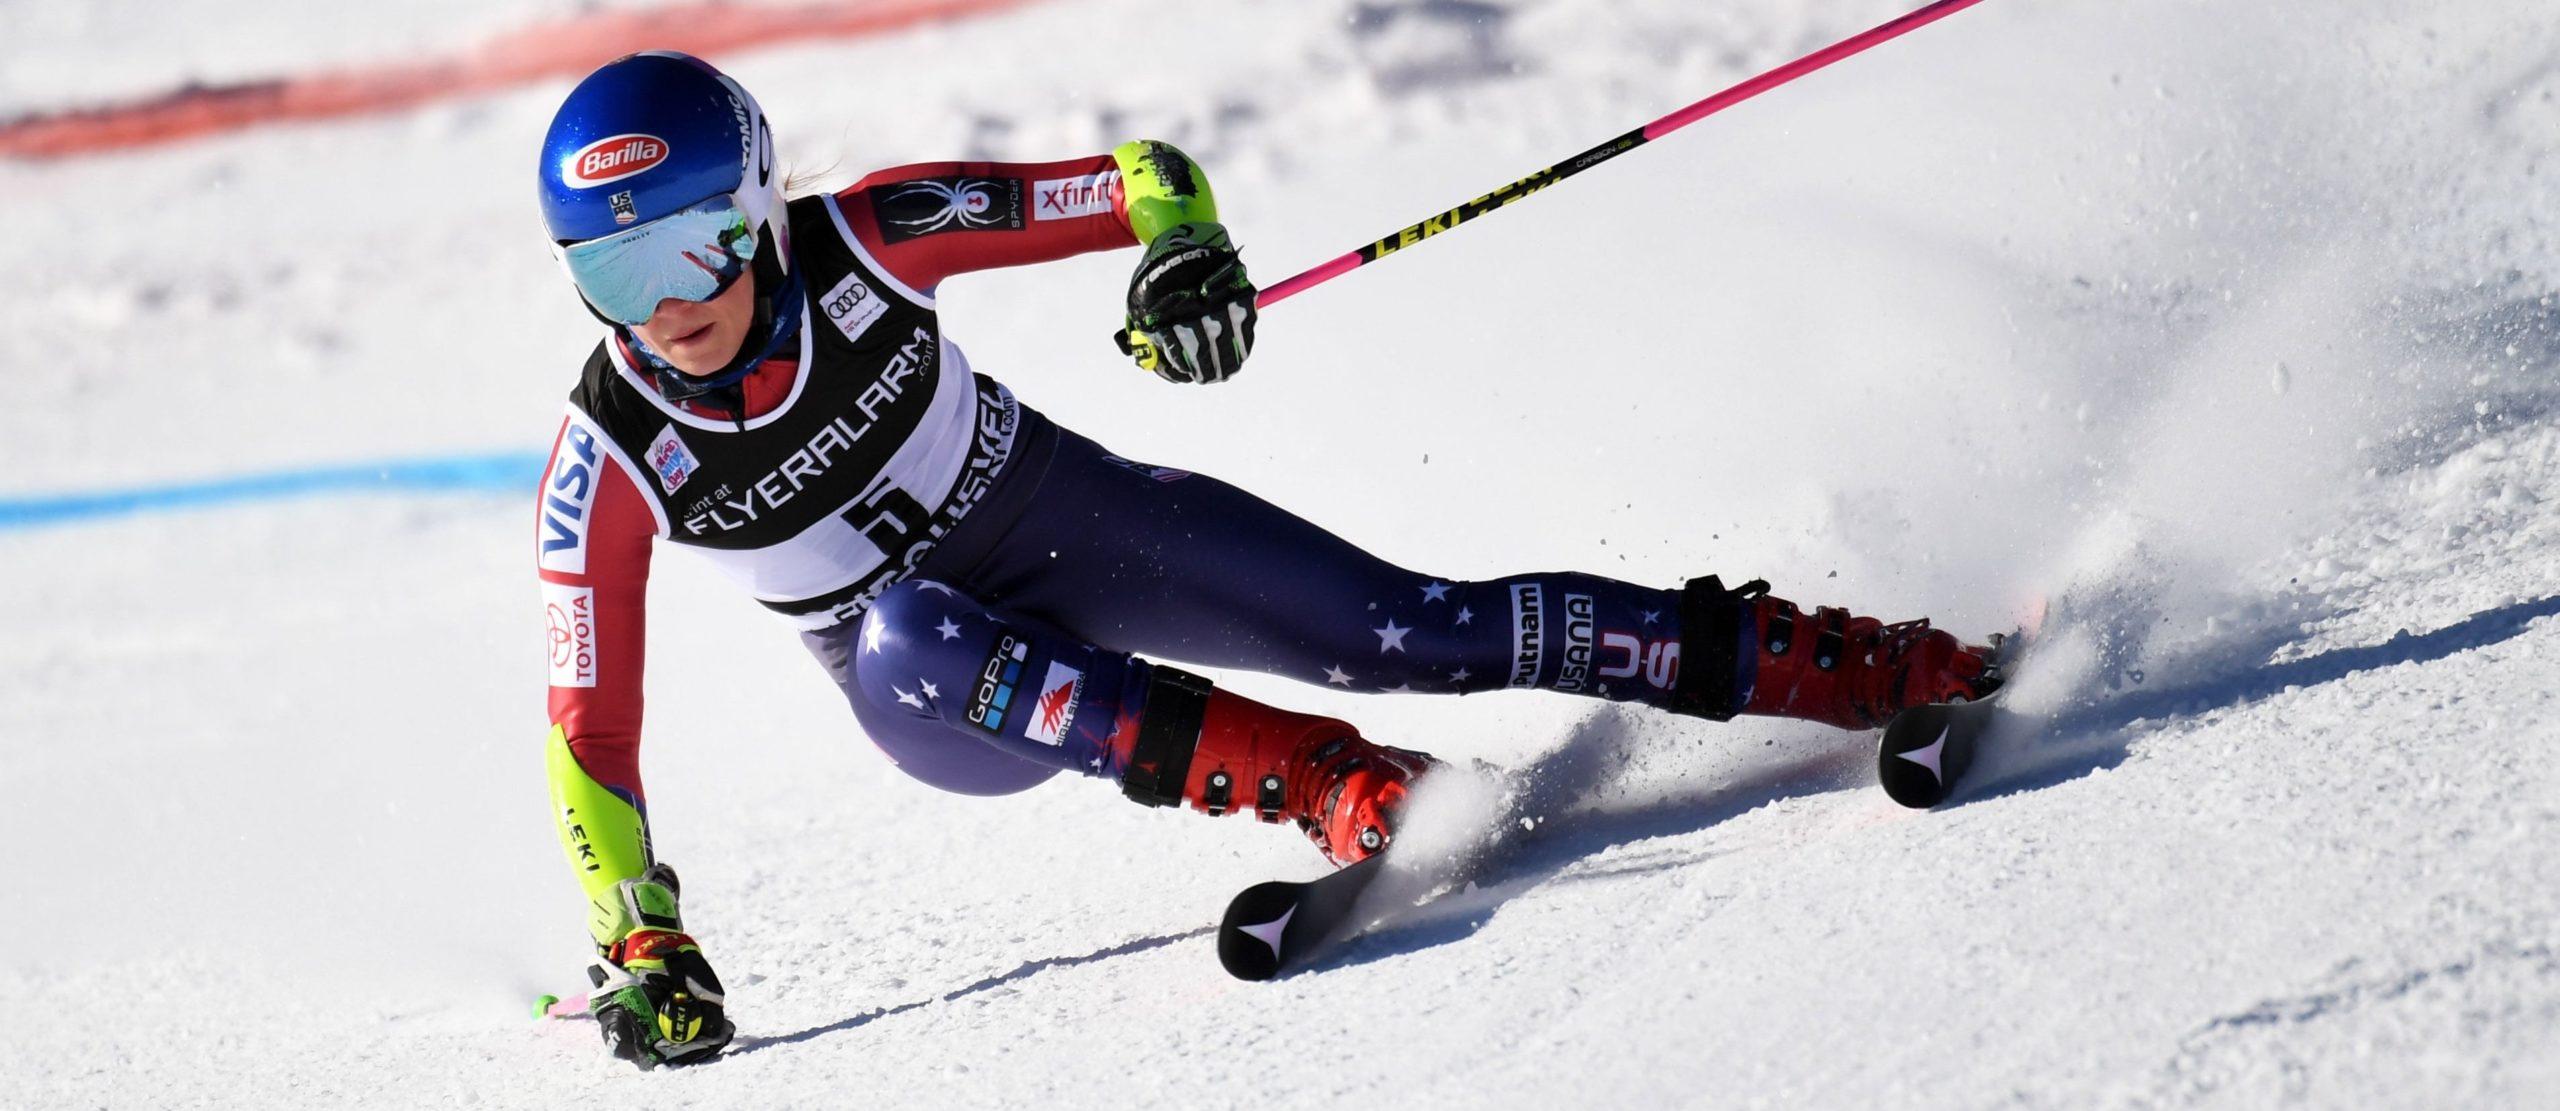 Coupe du Monde ski alpin dames Courchevel